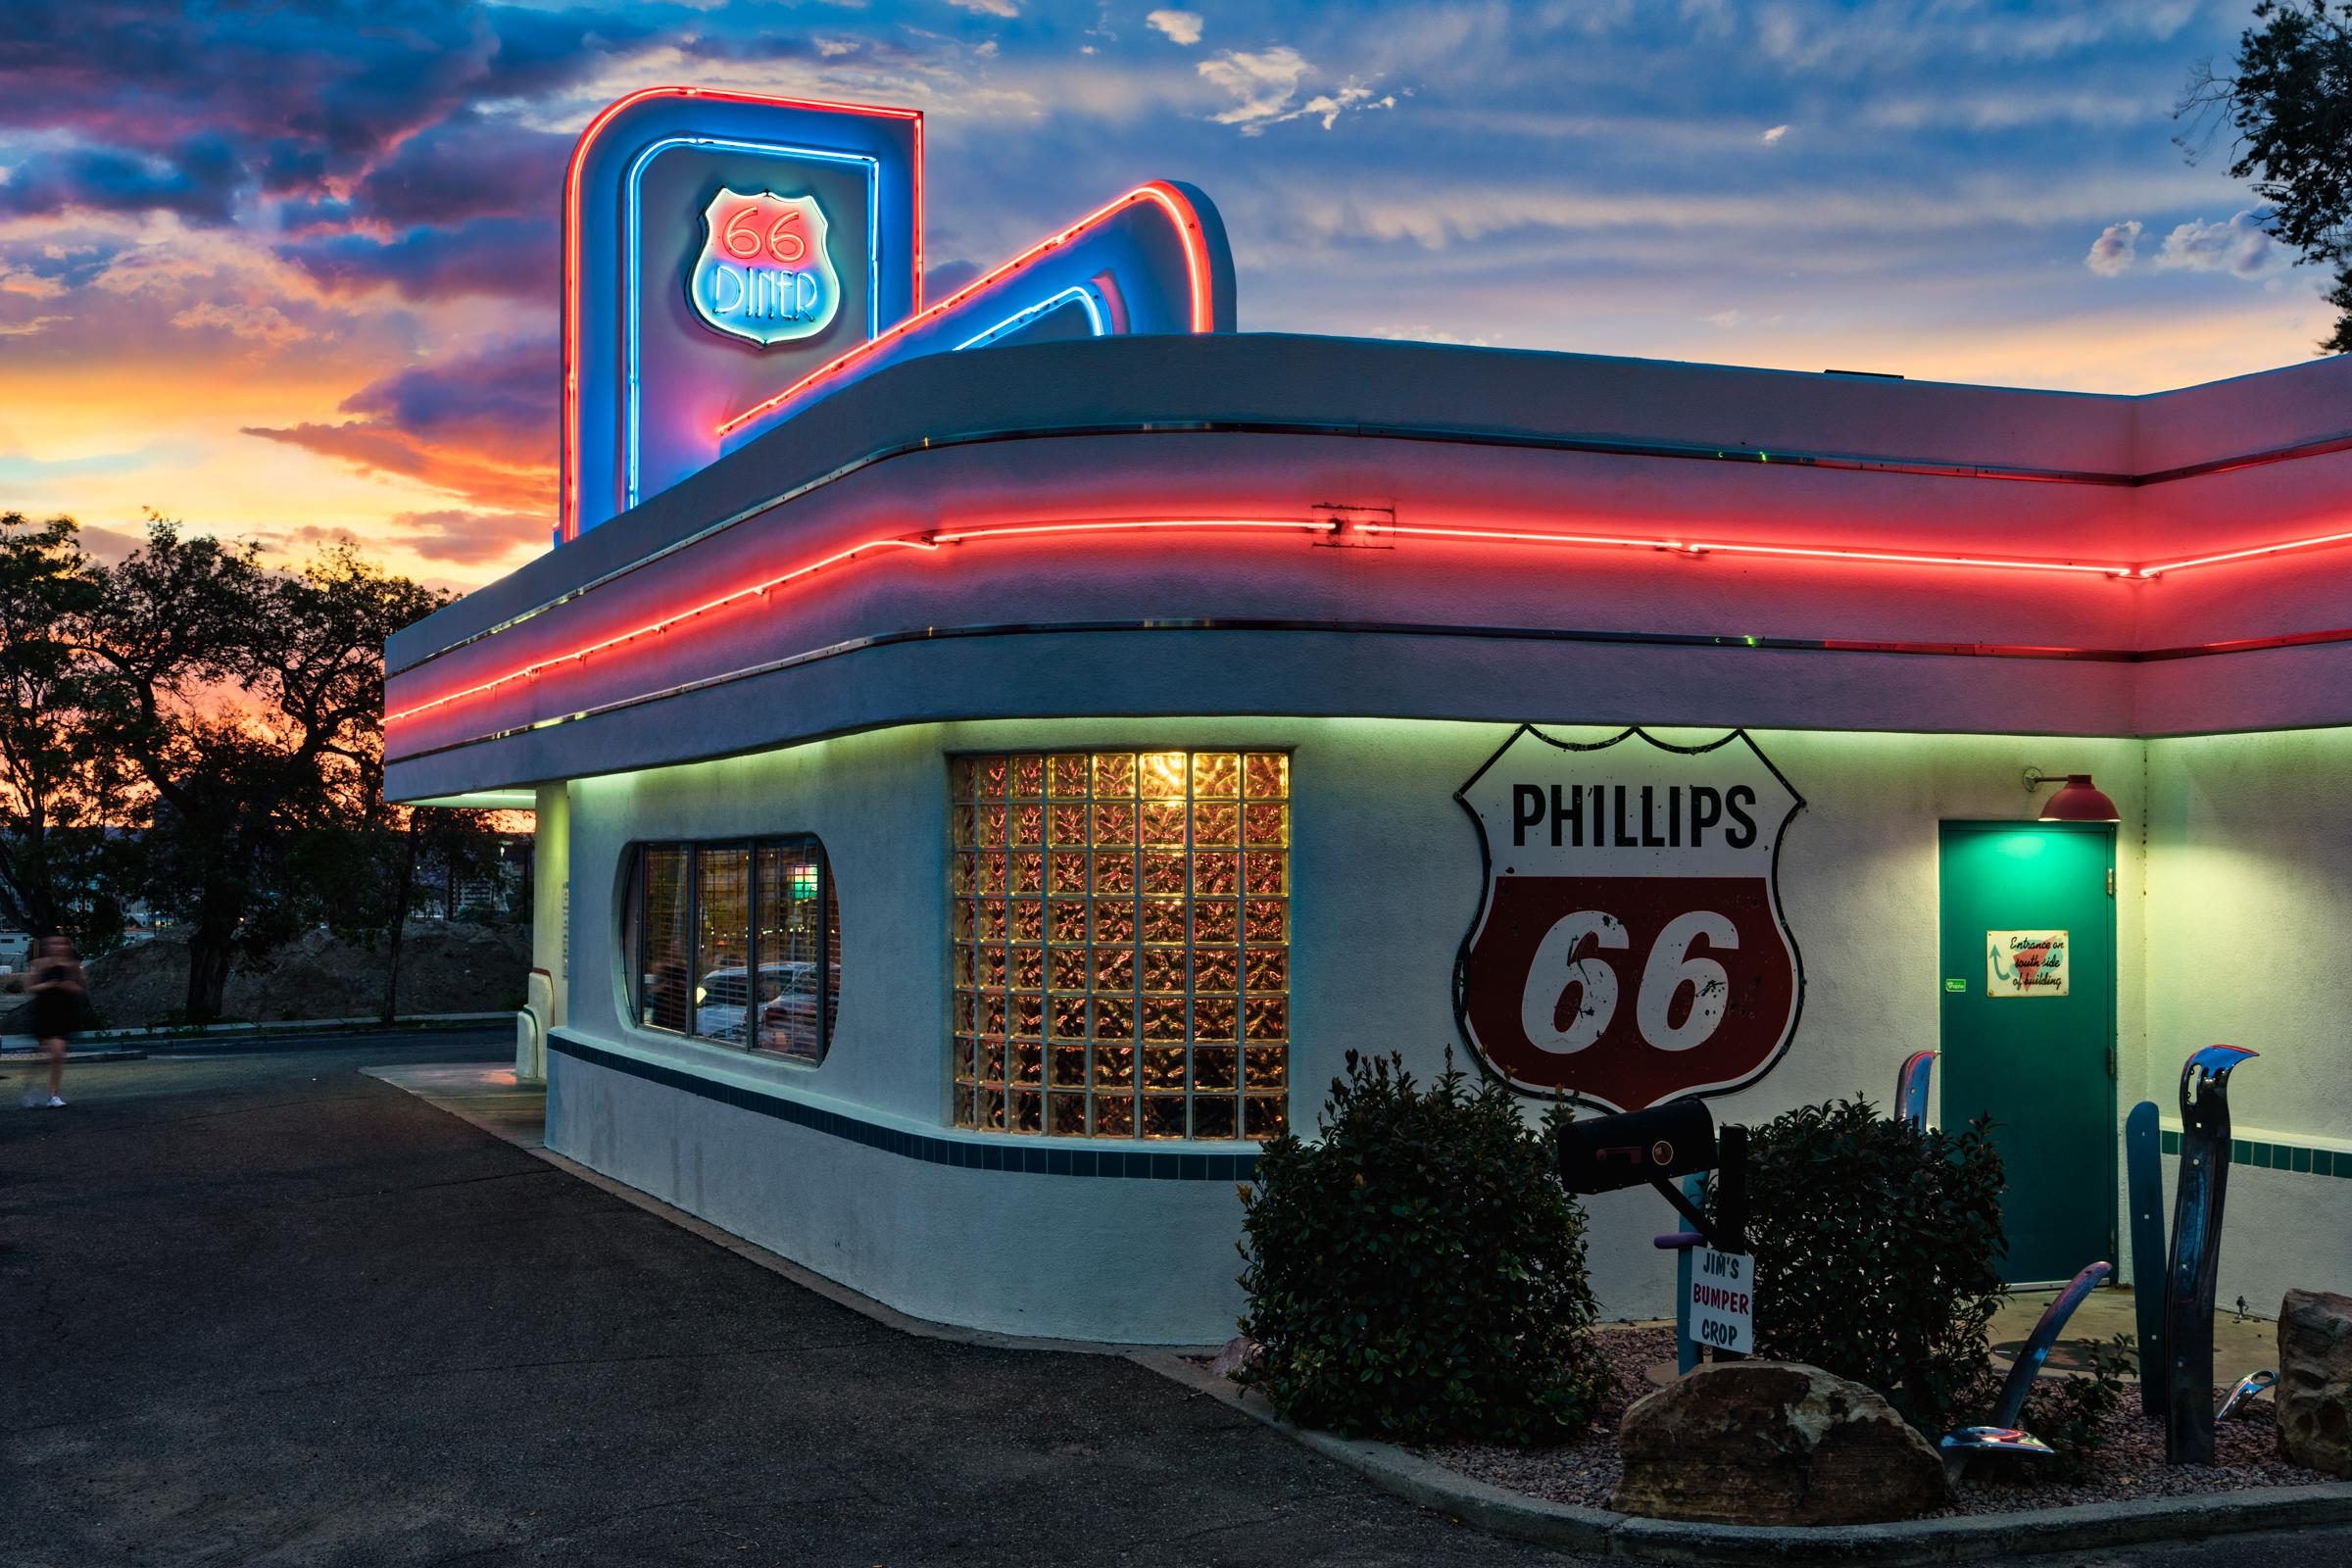 NM-Rt66-ABQ-66-Diner-sunset-HDR-1a.jpg